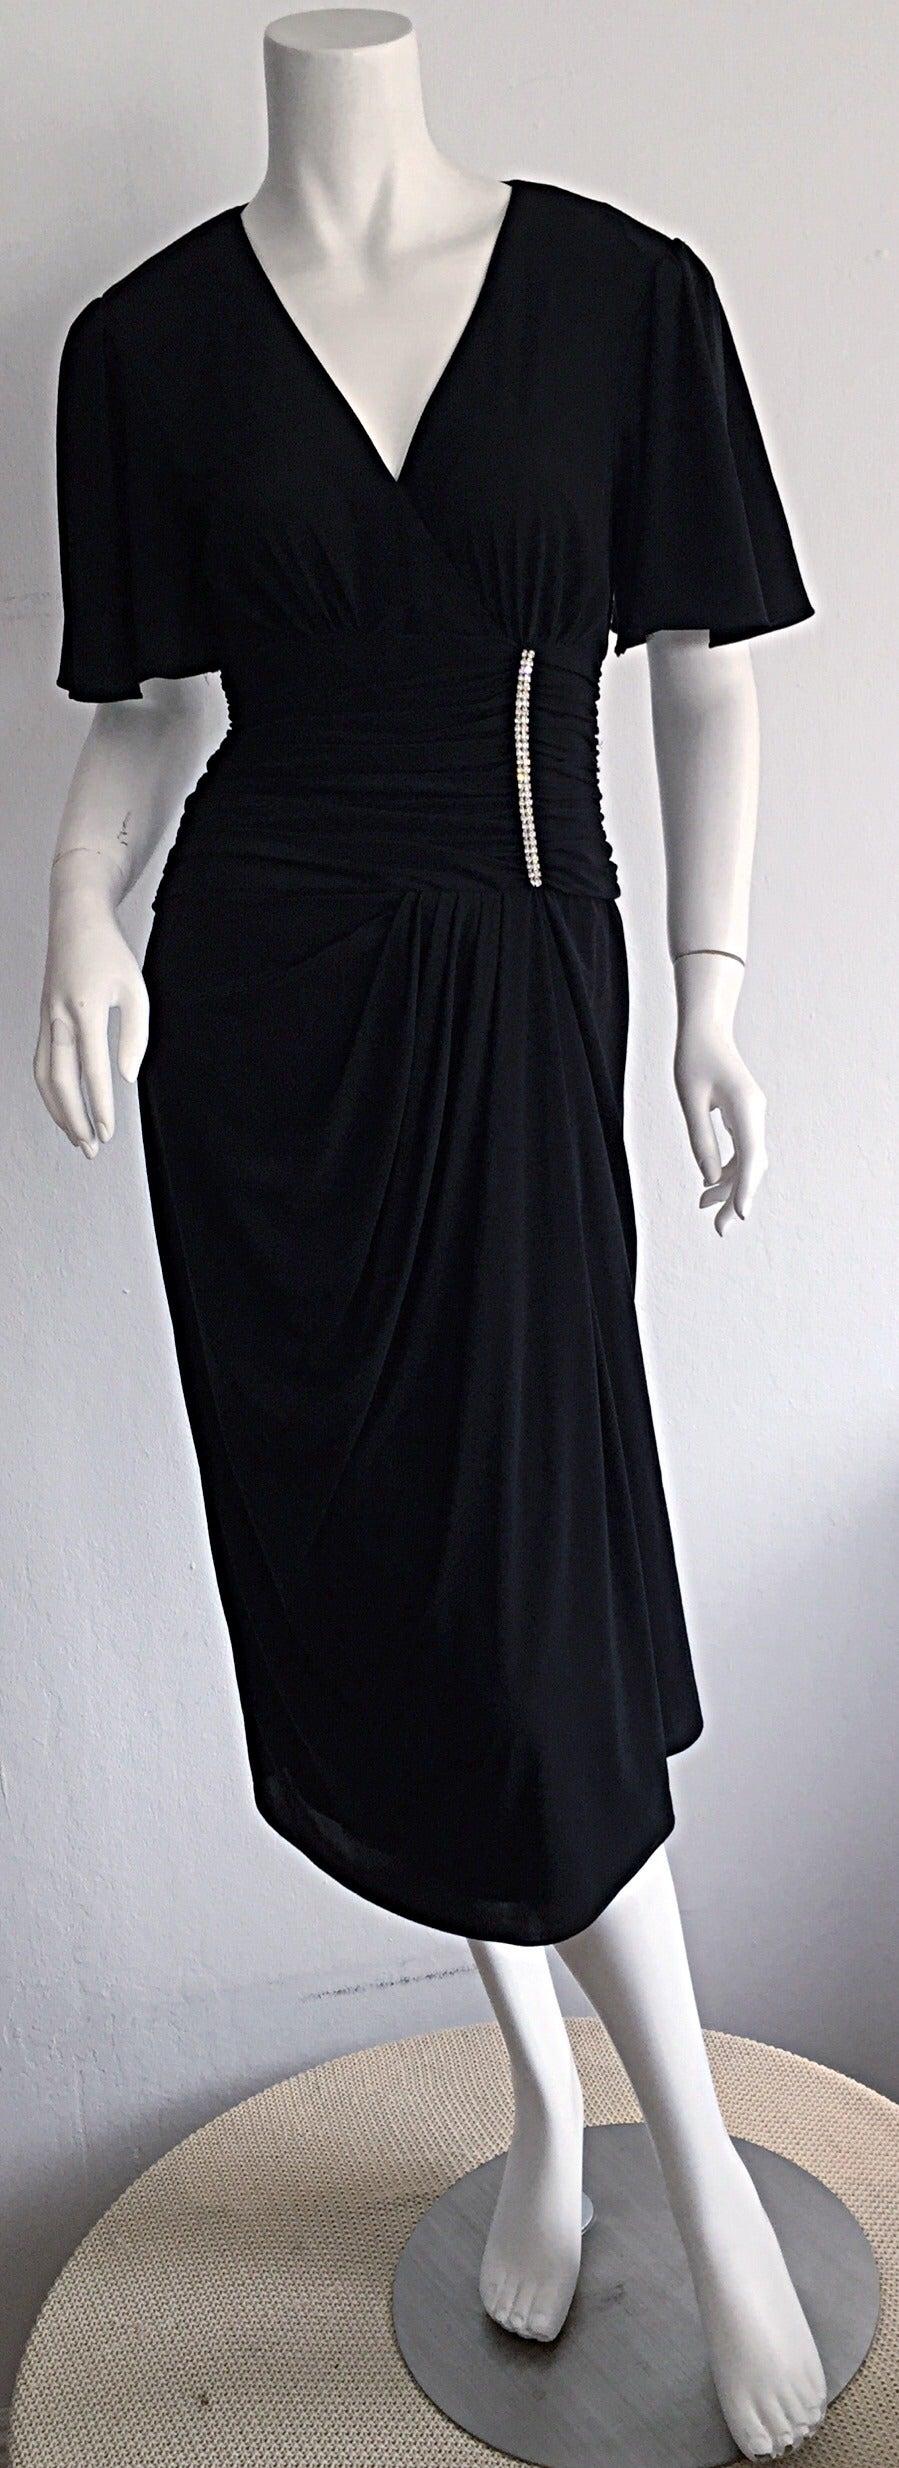 Black dress neiman marcus - Gorgeous Vintage Neiman Marcus 1940s Style Classic Black Dress W Rhinestones 2